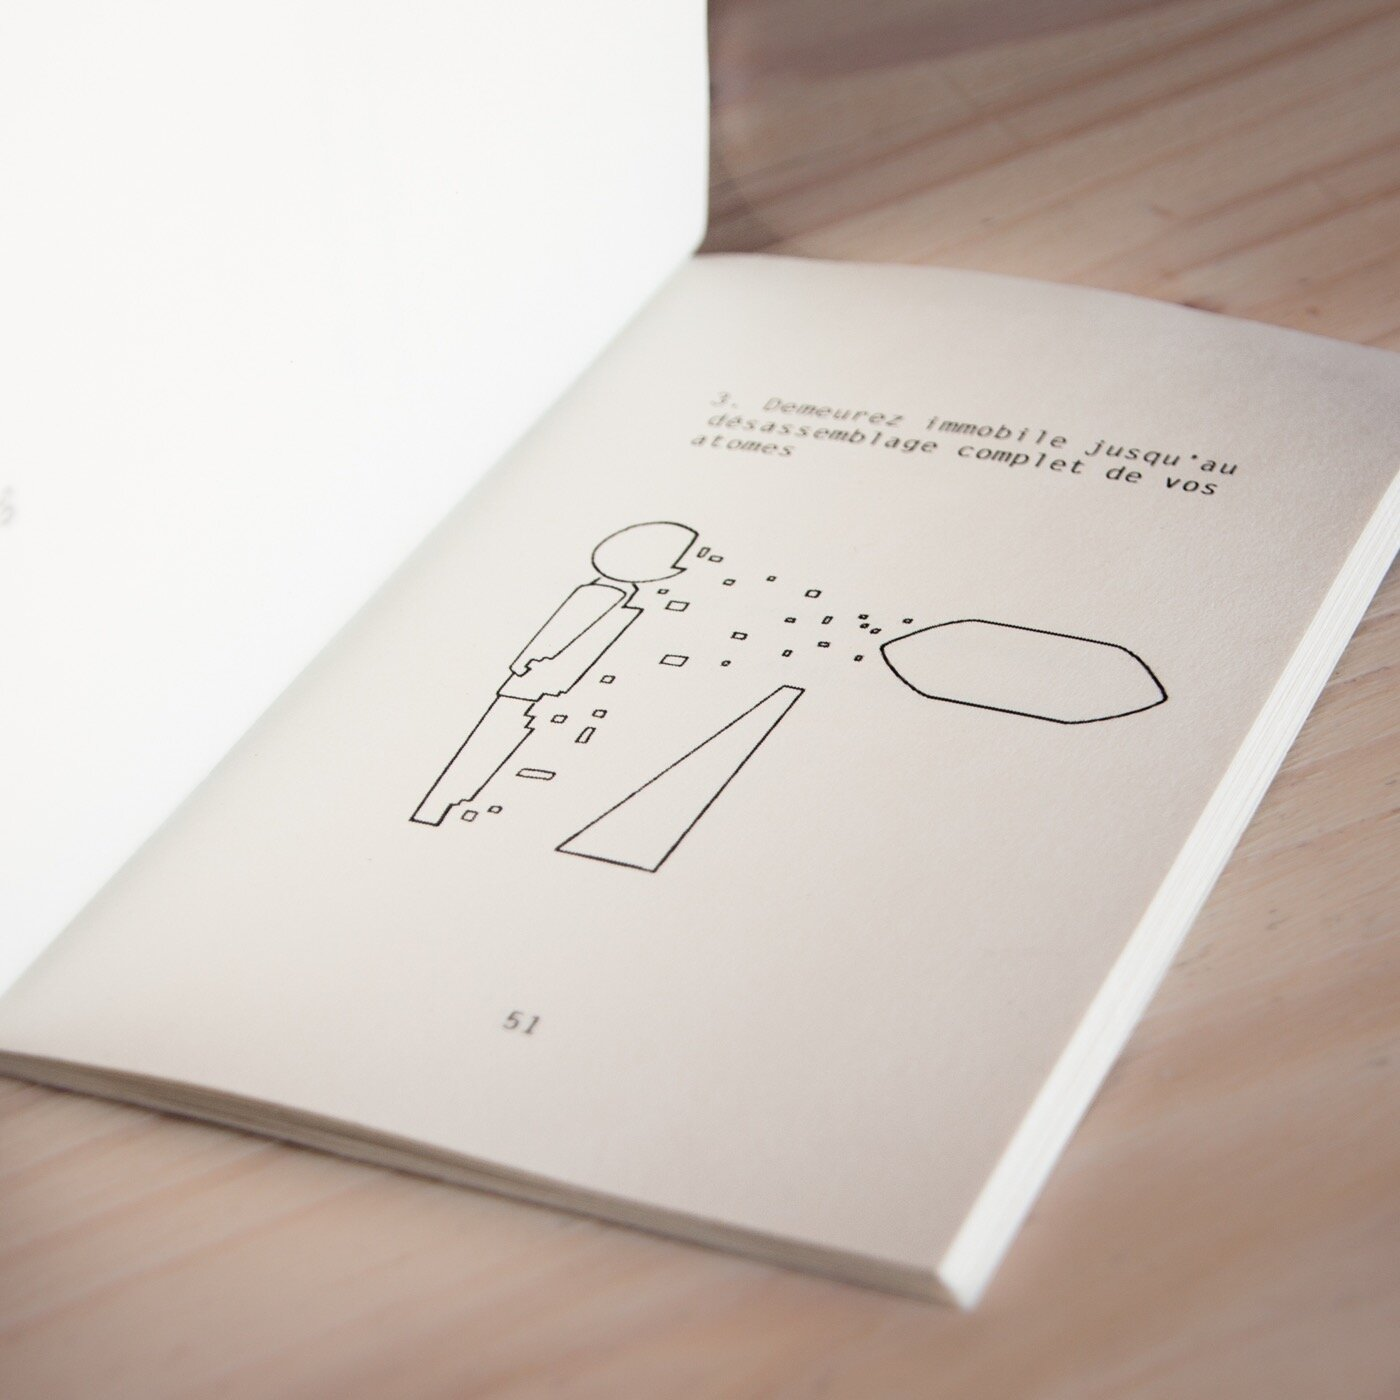 adn-olivier-lamarre-design-graphiste-5-2.jpg